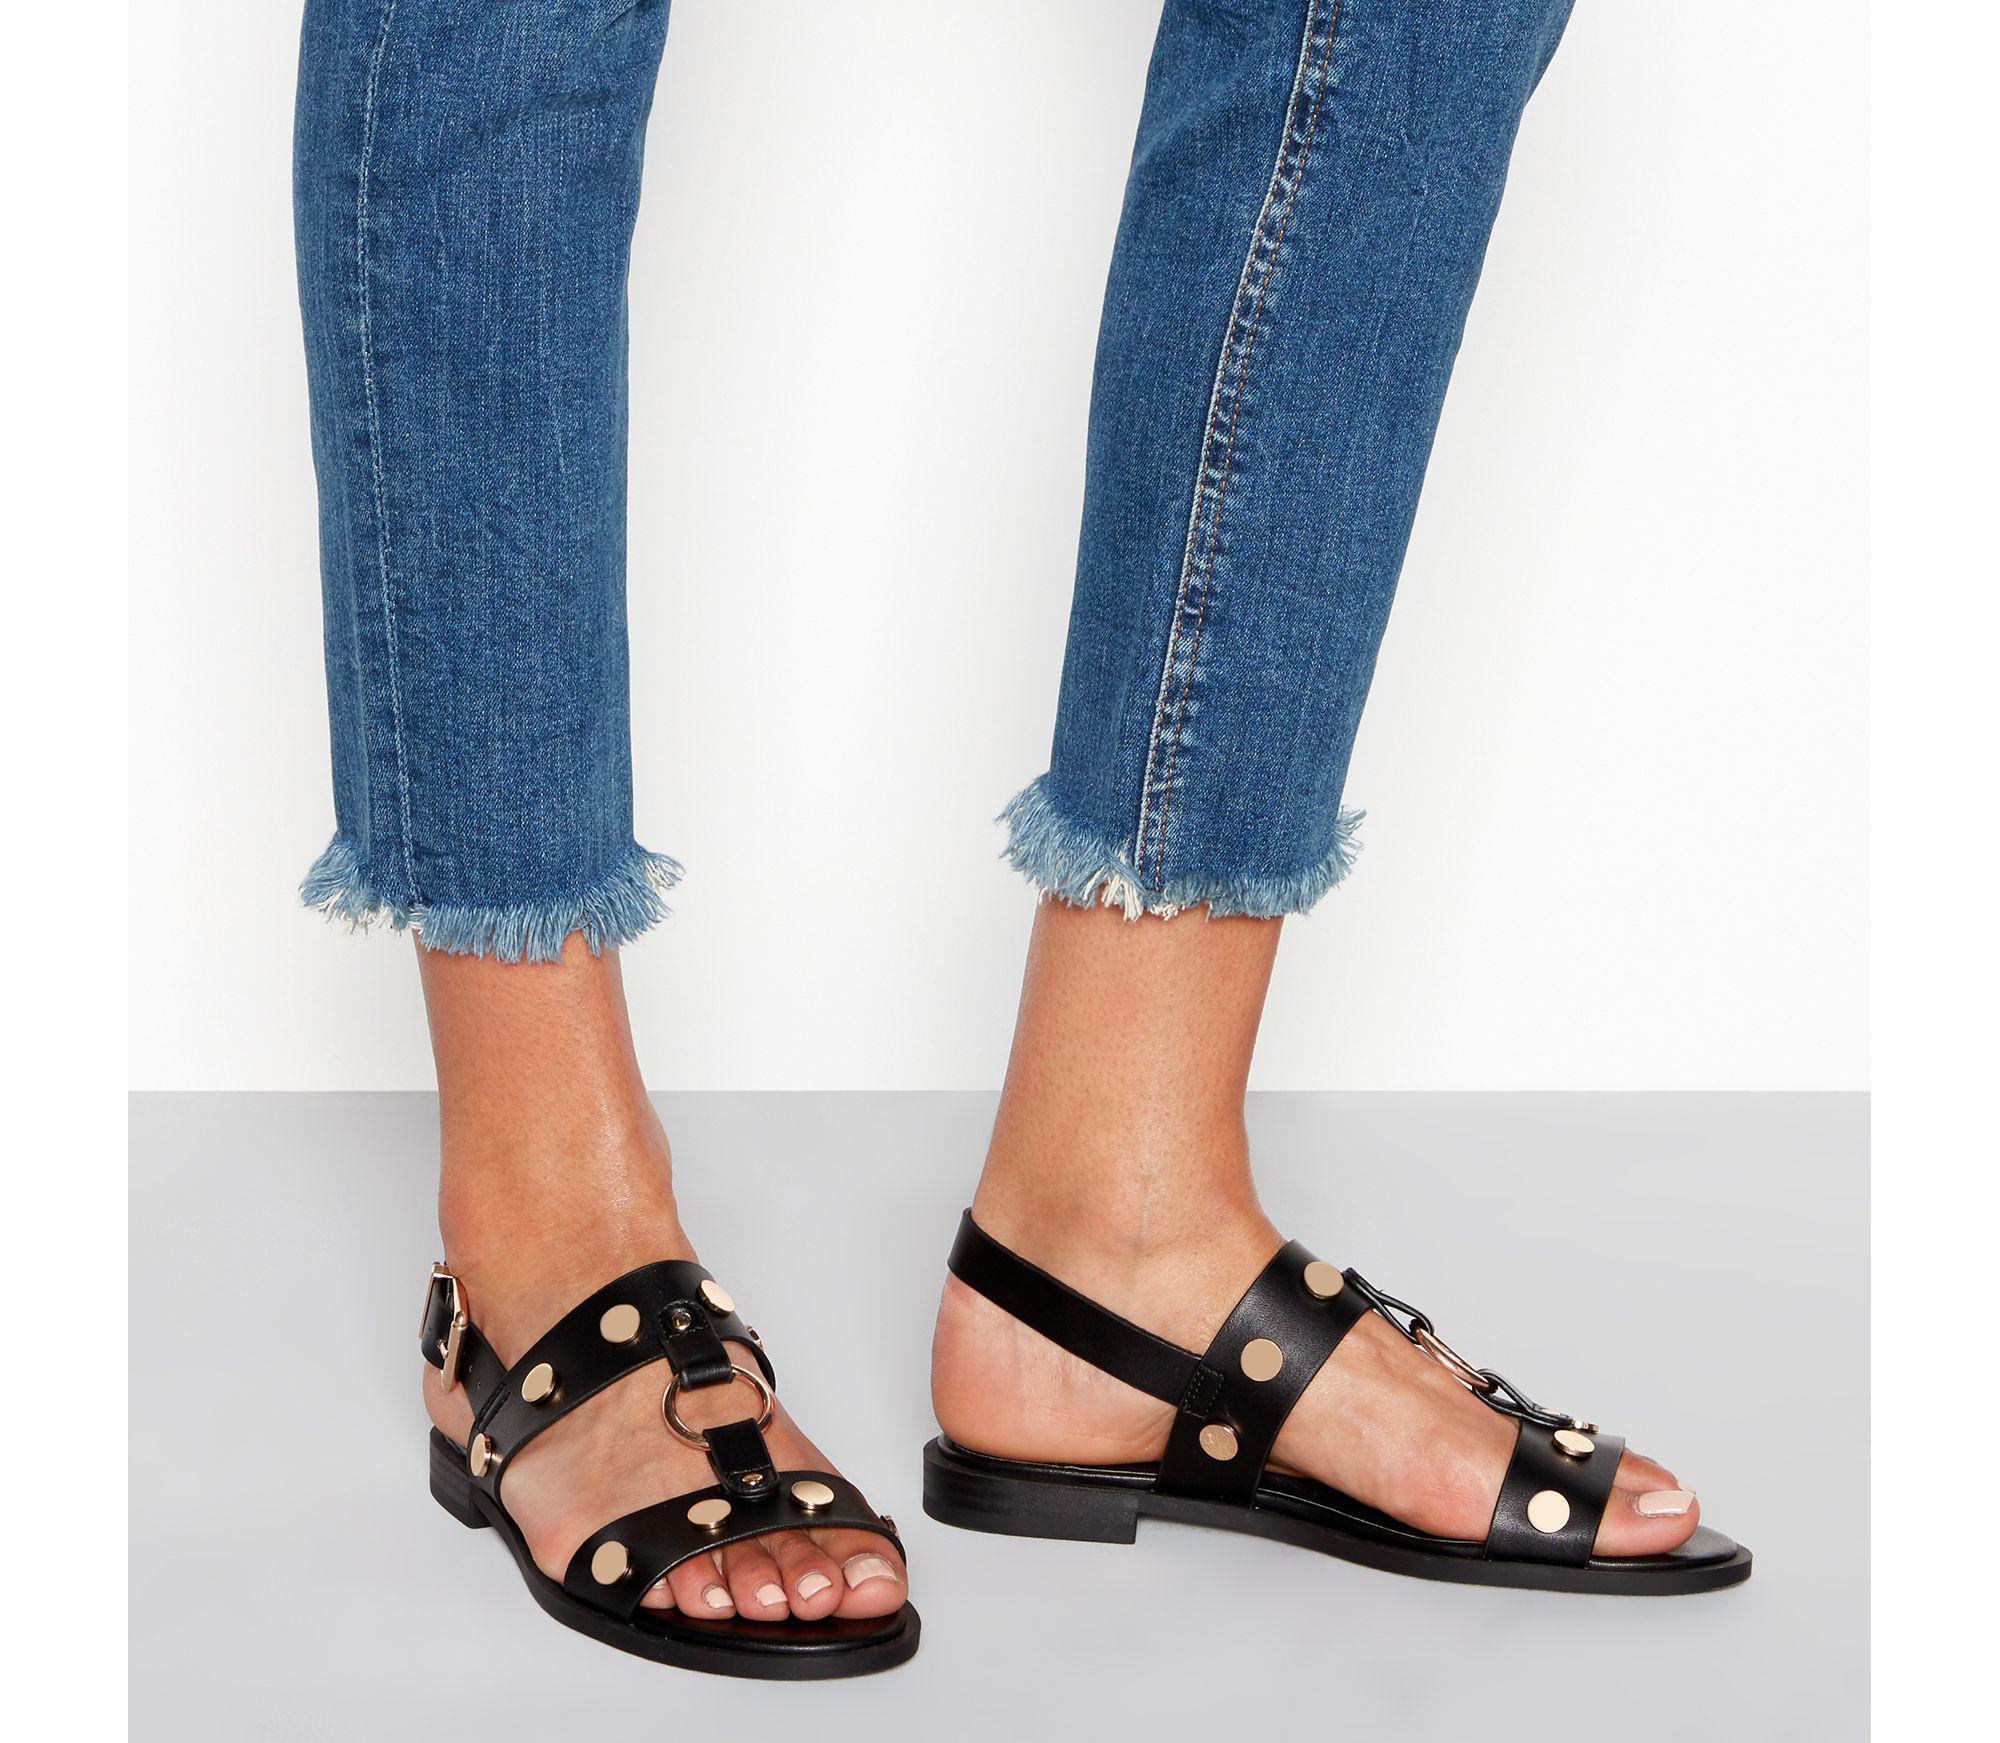 6f5228abe31 Faith Black Studded Slingback Gladiator Sandals in Black - Lyst